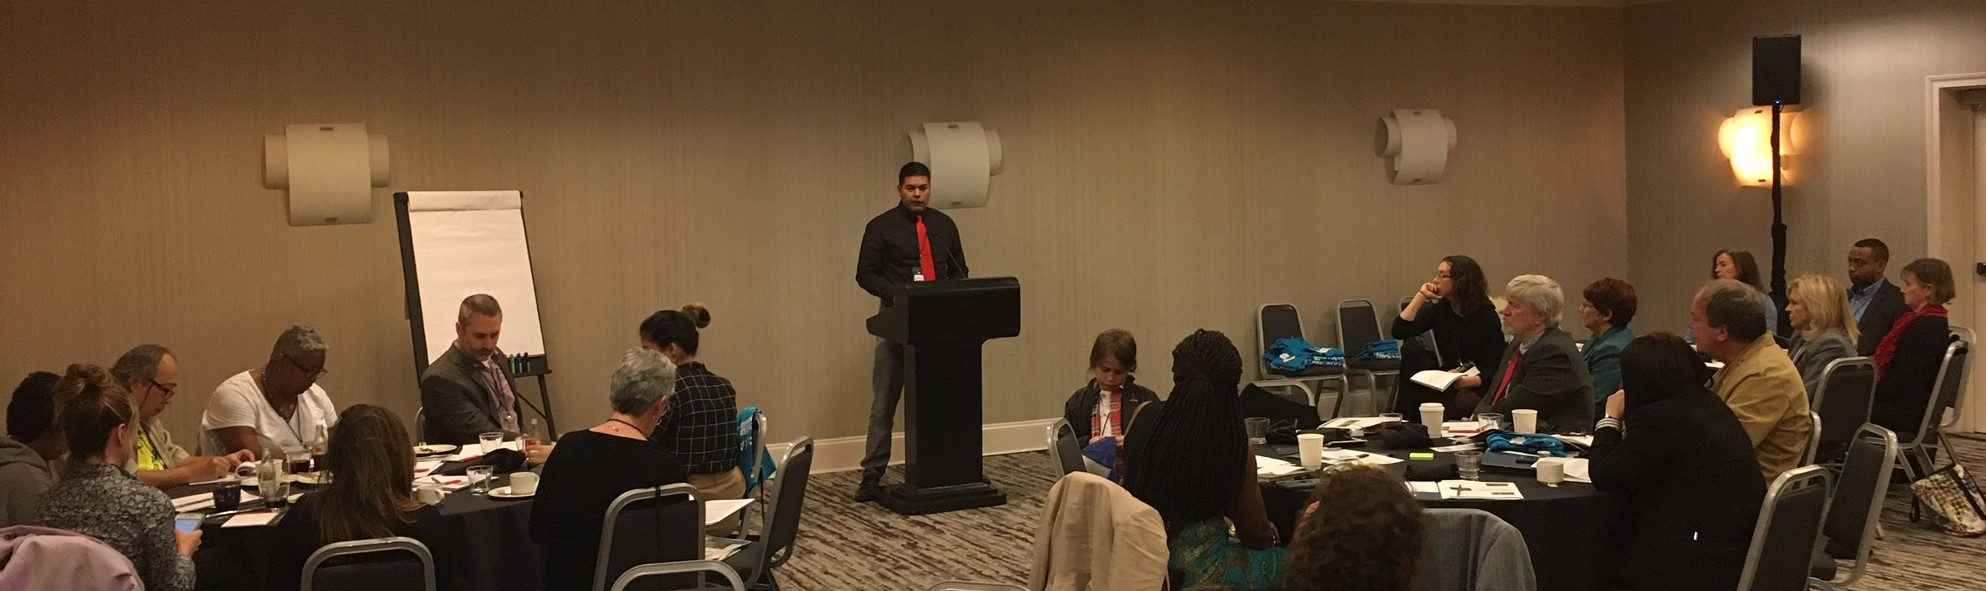 Derrick Toledo, representing the Western Leaders Network, briefing environmental allies about his work